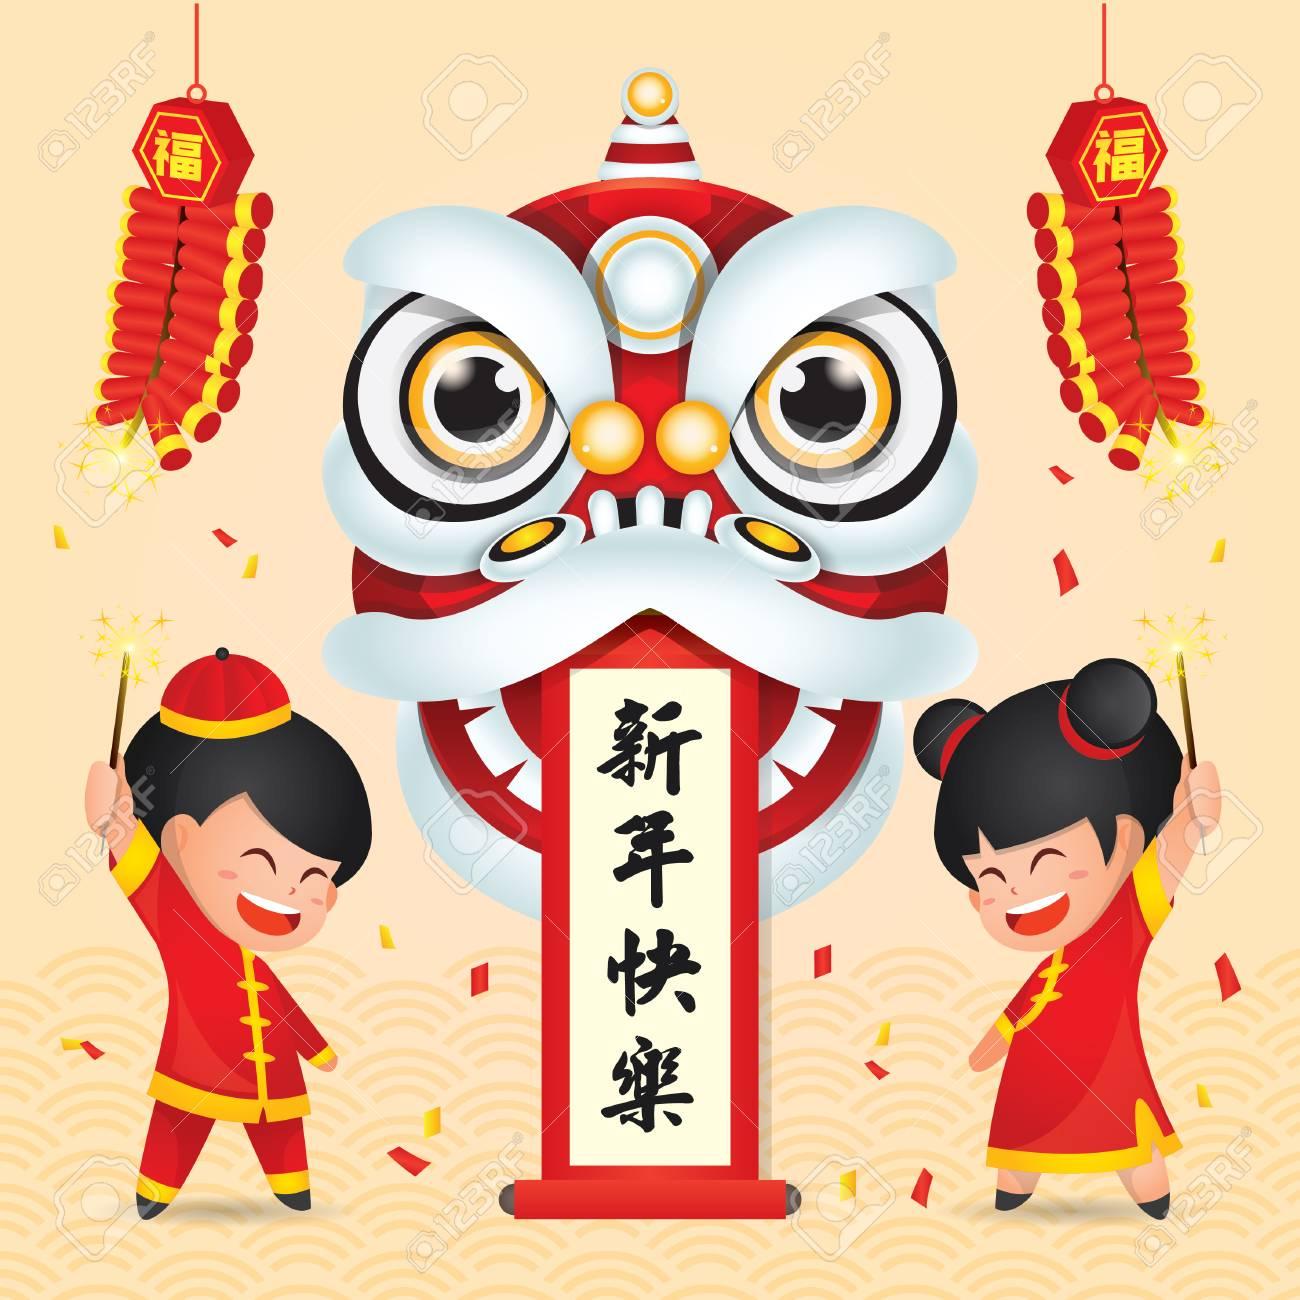 Chinese New Year Lion Dance Vector Illustration. (Translation: Lion Dance) - 114725199